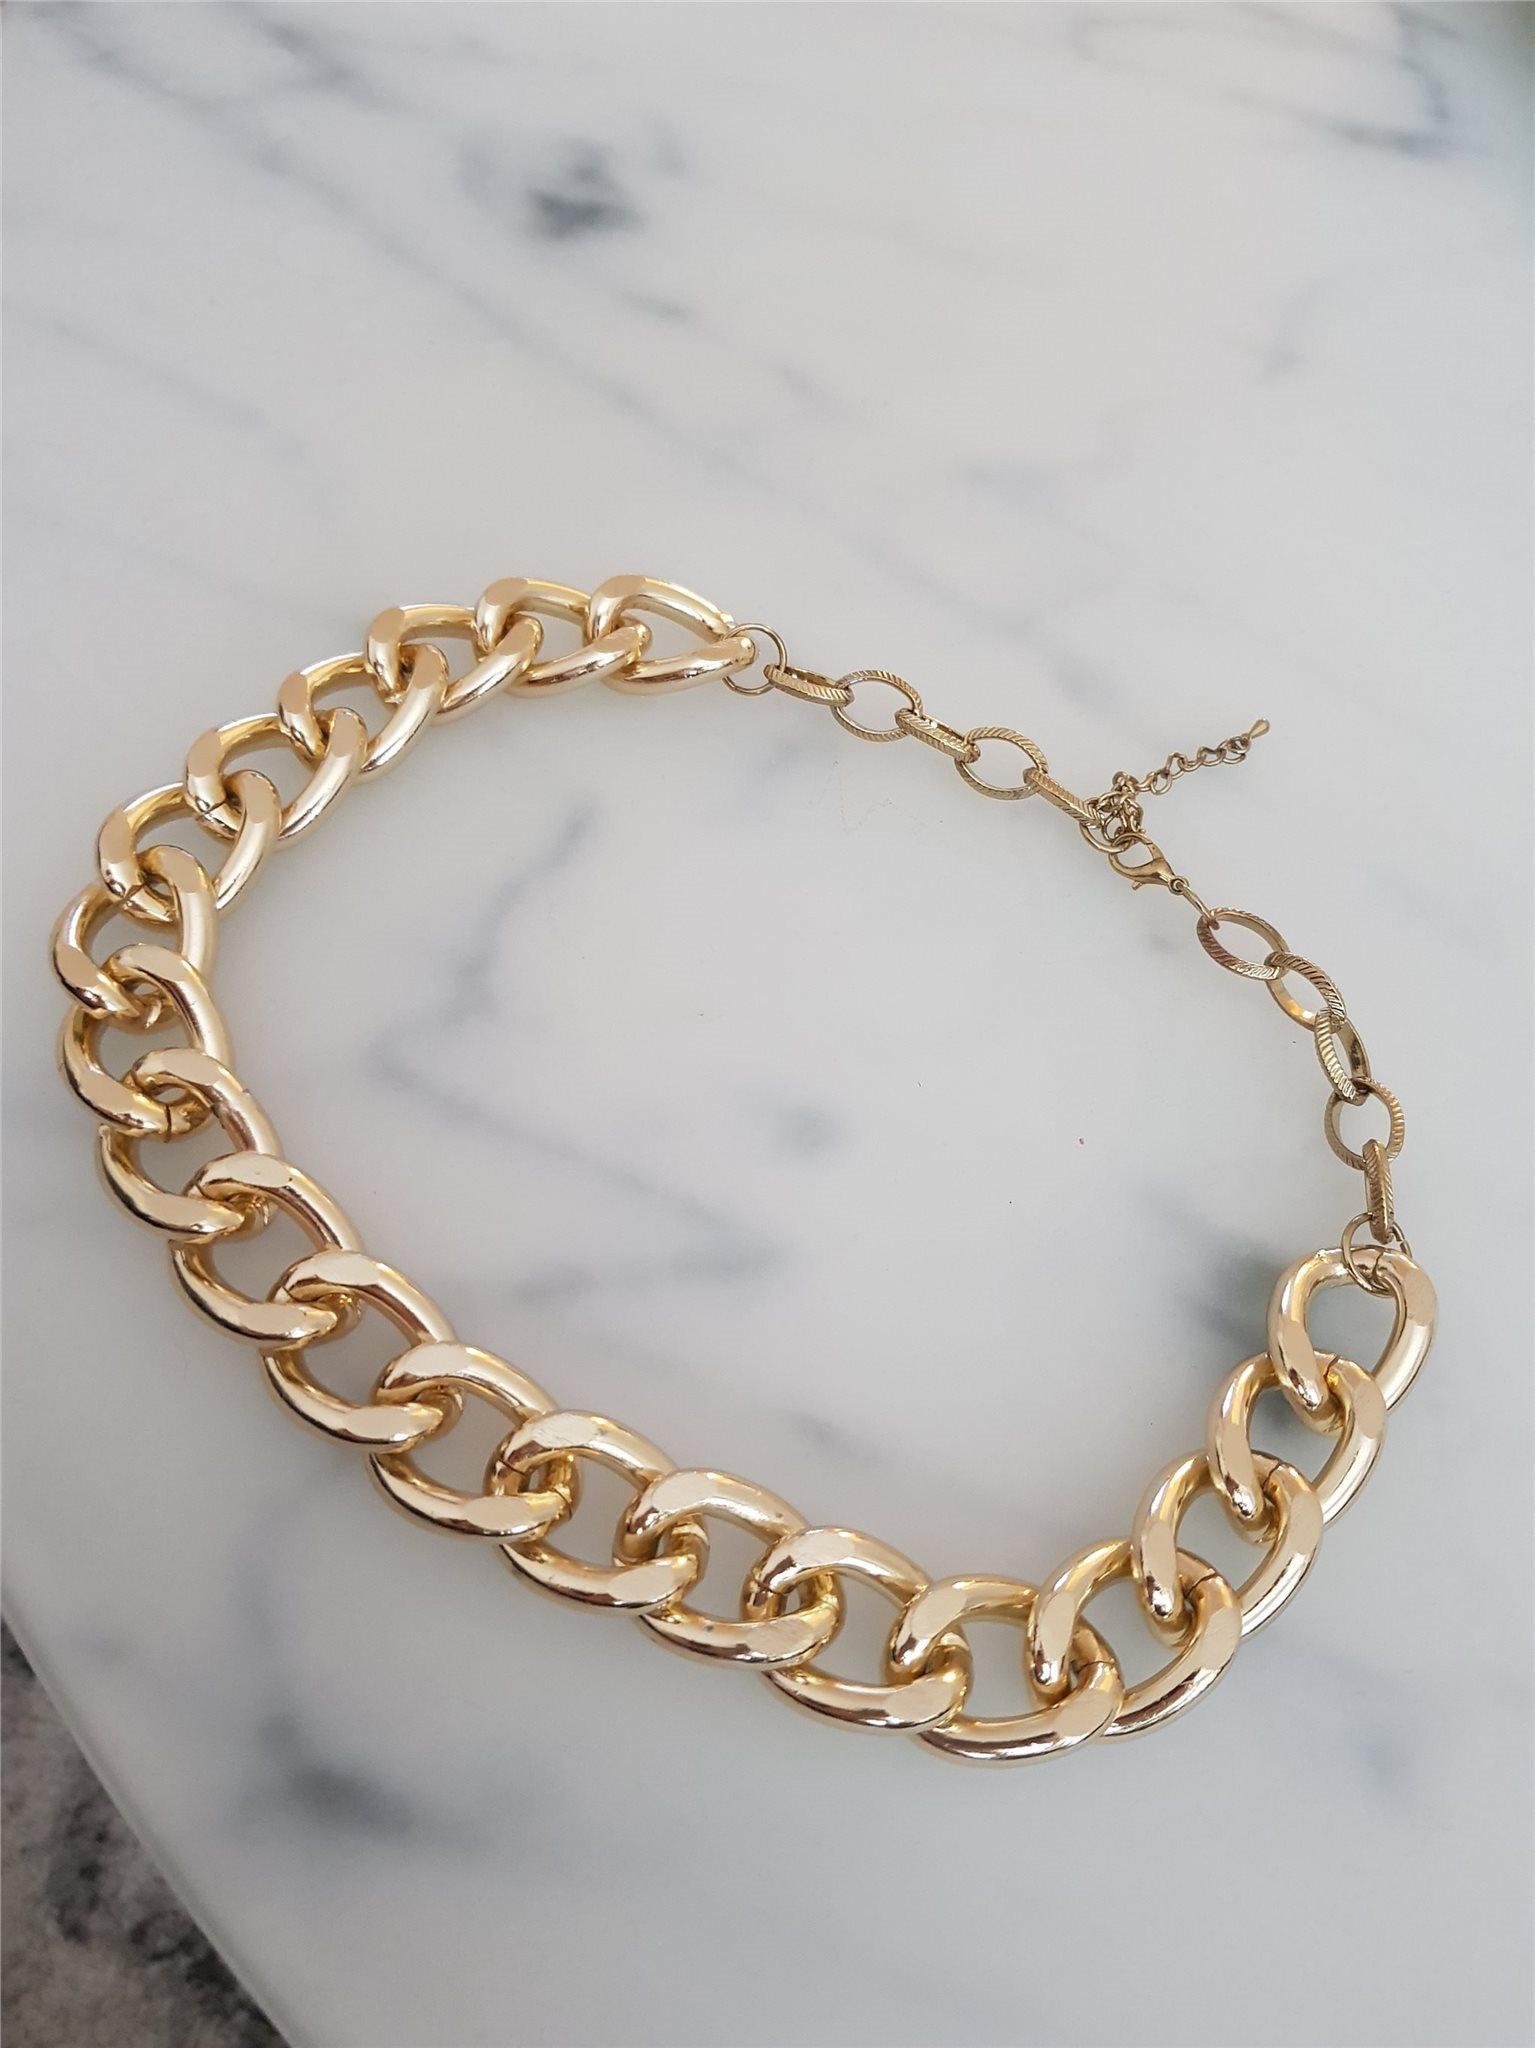 Fejk guld halsband (329059609) ᐈ Köp på Tradera e387251d59f55